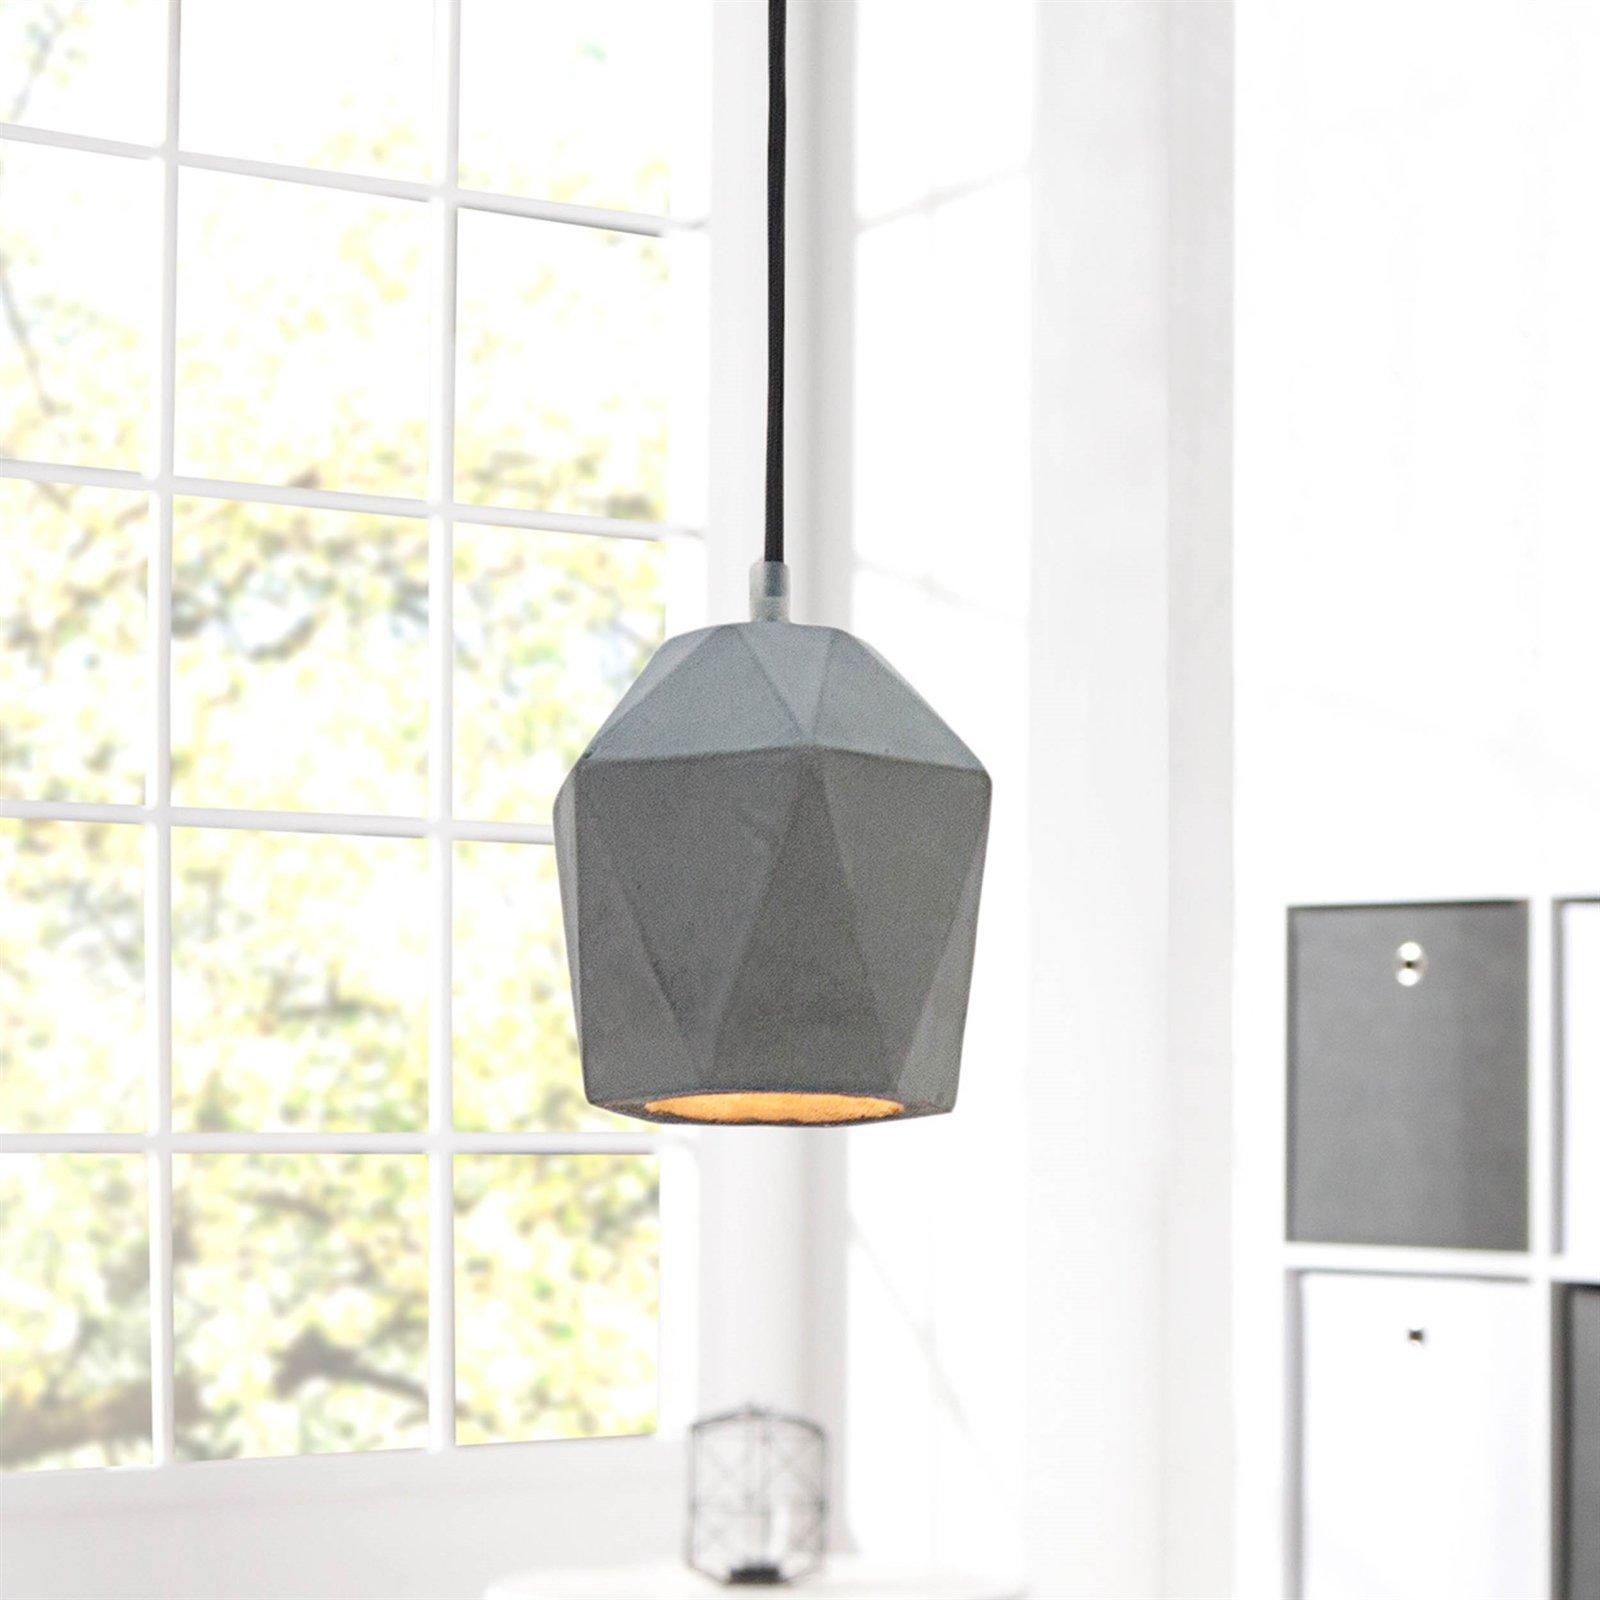 Betonlampe hängende Lampe Lampenschirm